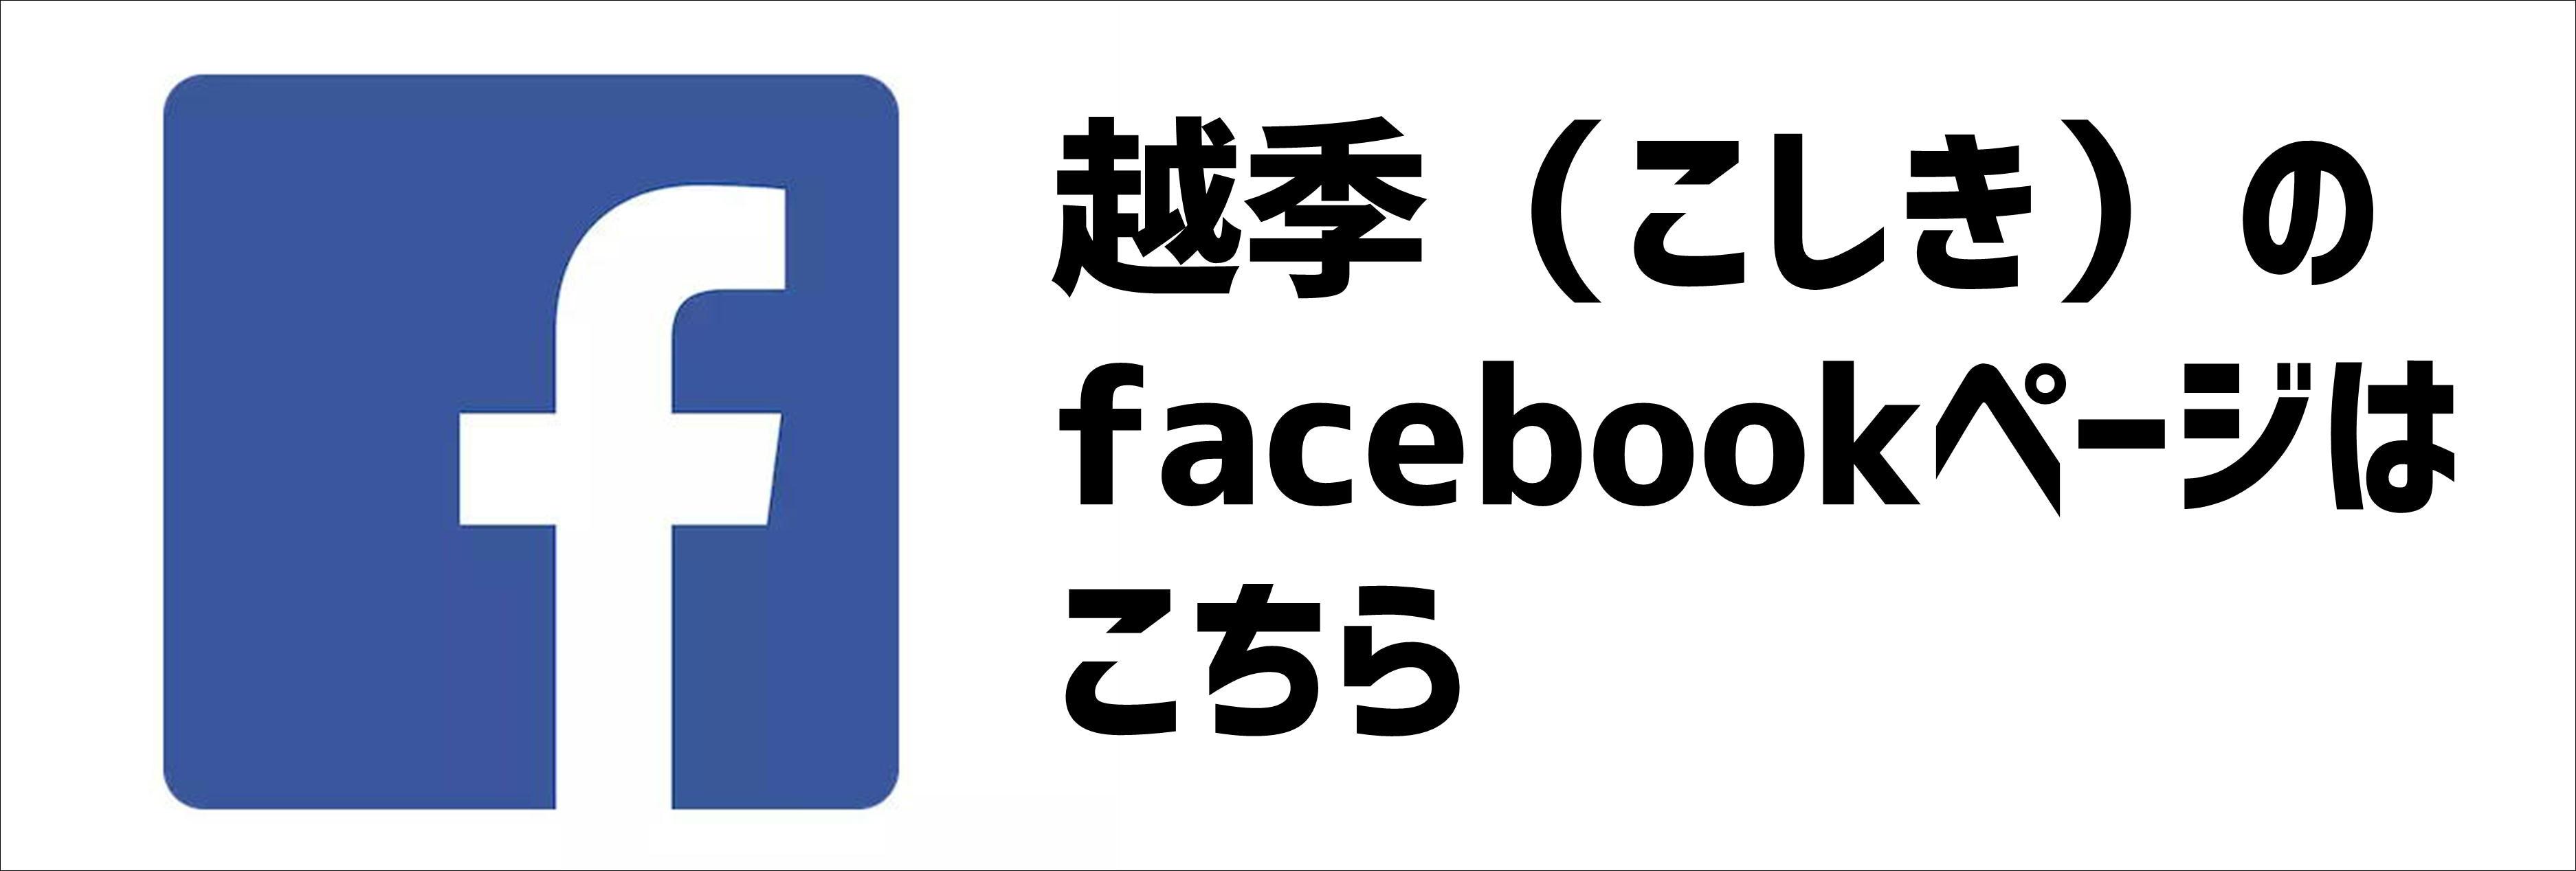 facebook越季